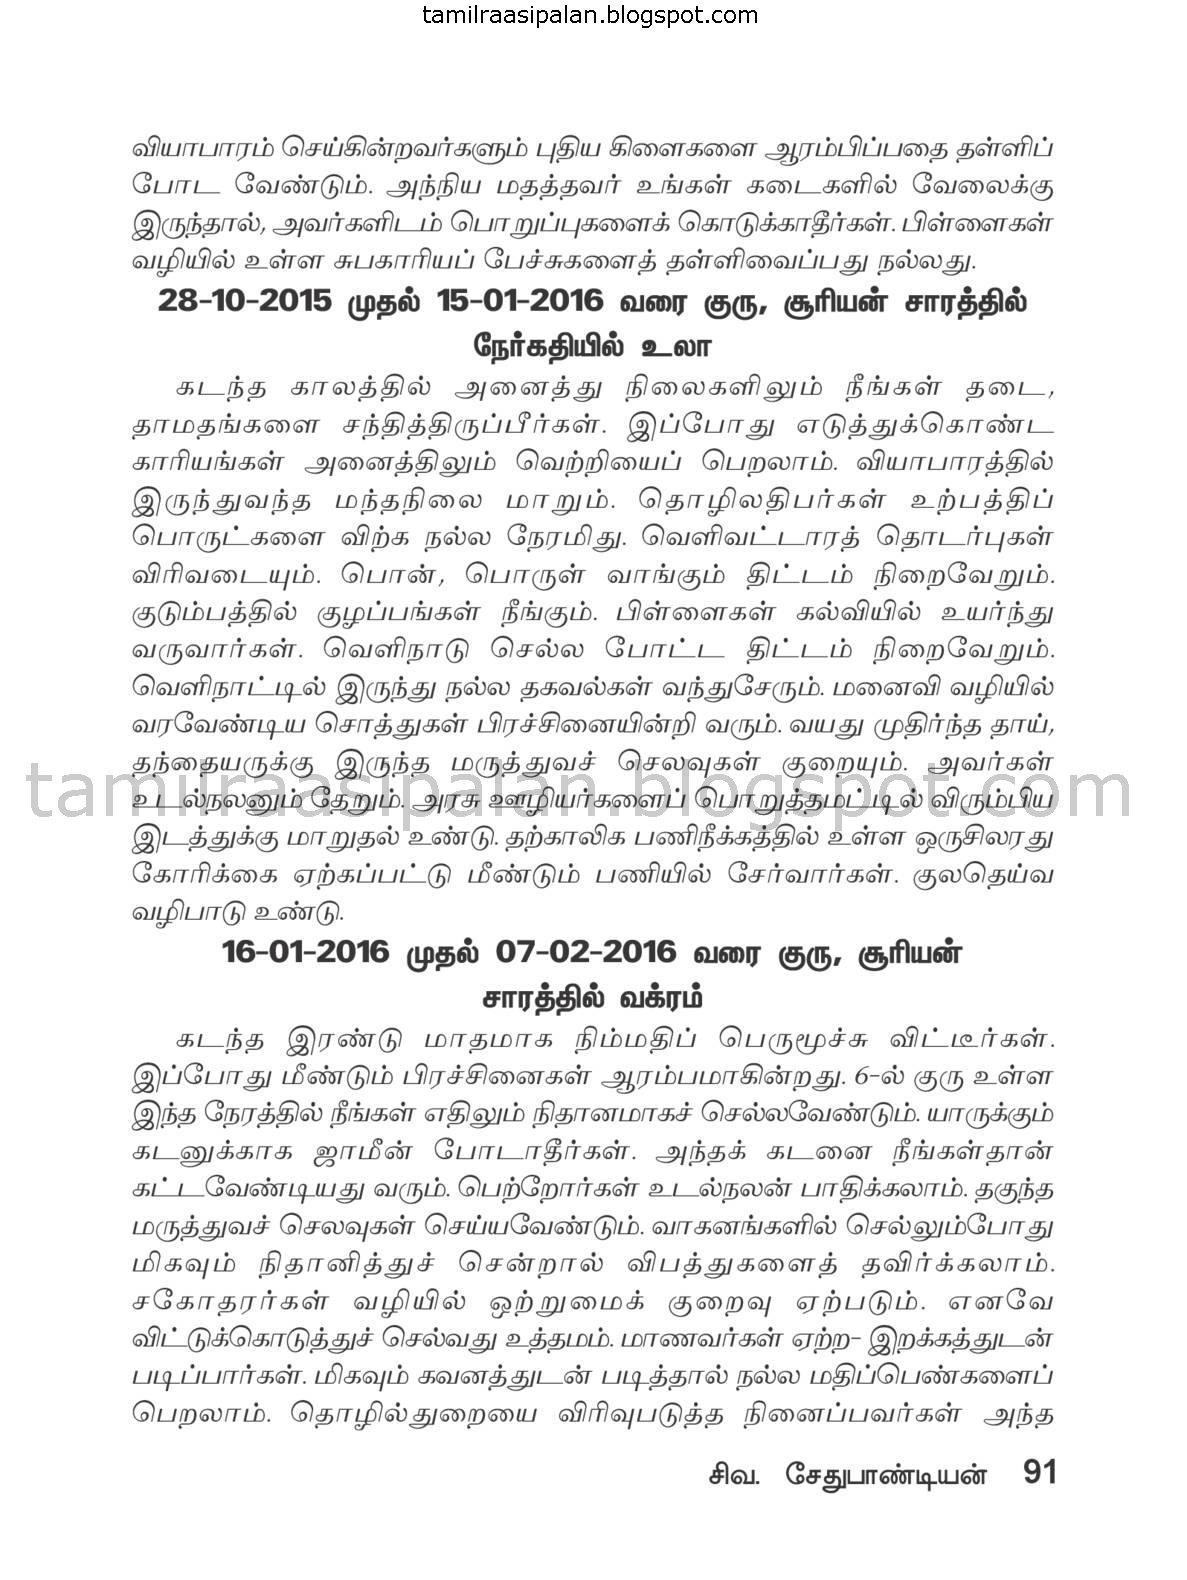 Meenam Guru Peyarchi Palan-2015-2016 Free Online